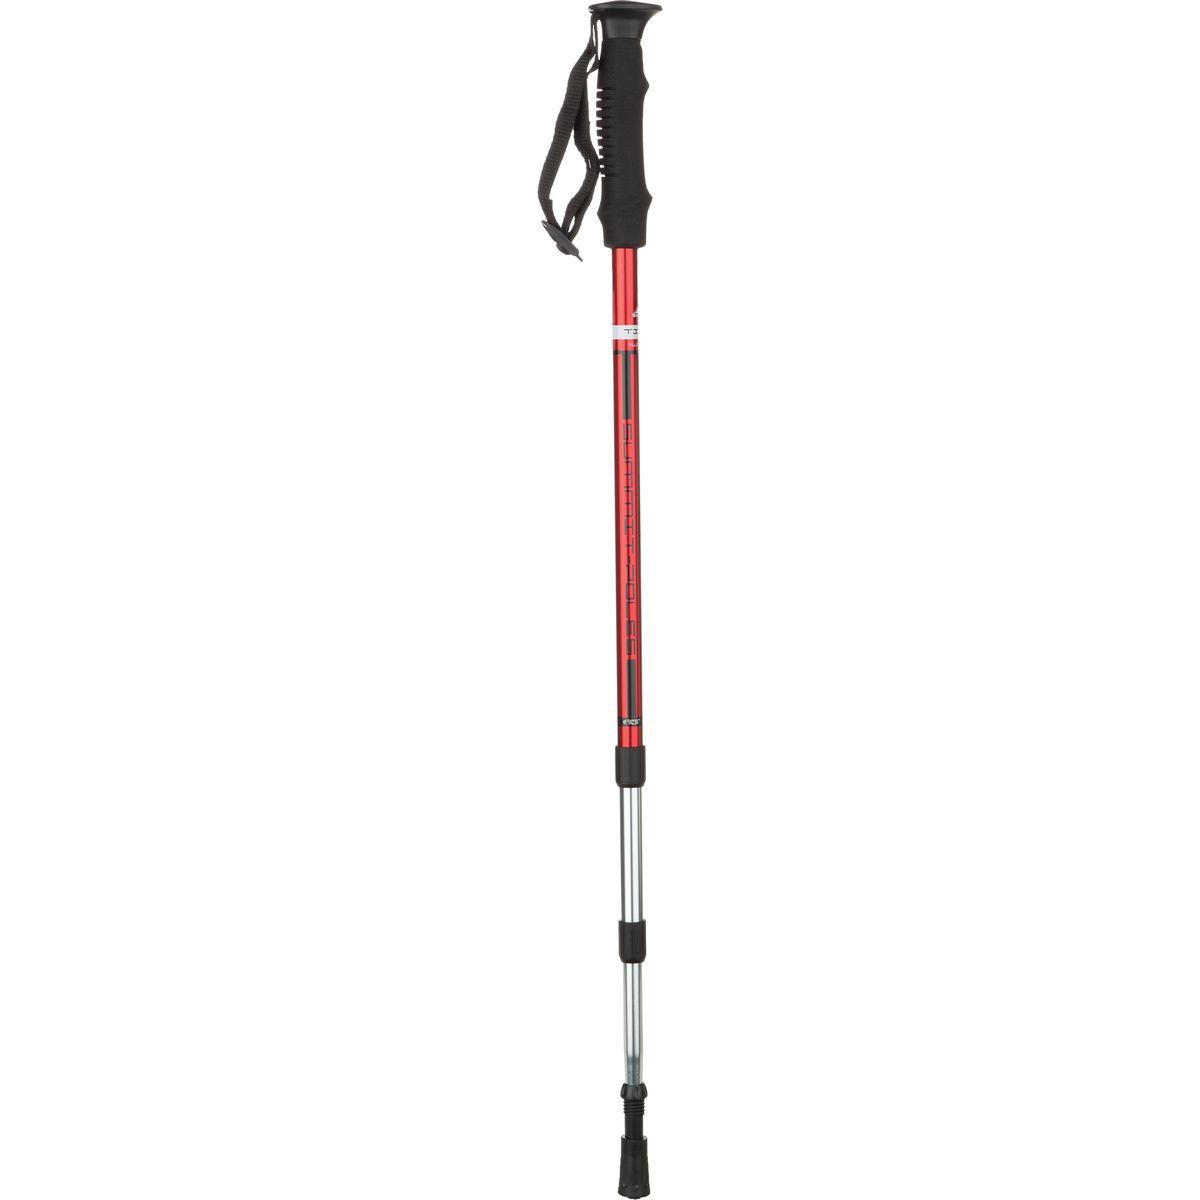 Arva Tibet Ski Pole Twistlock